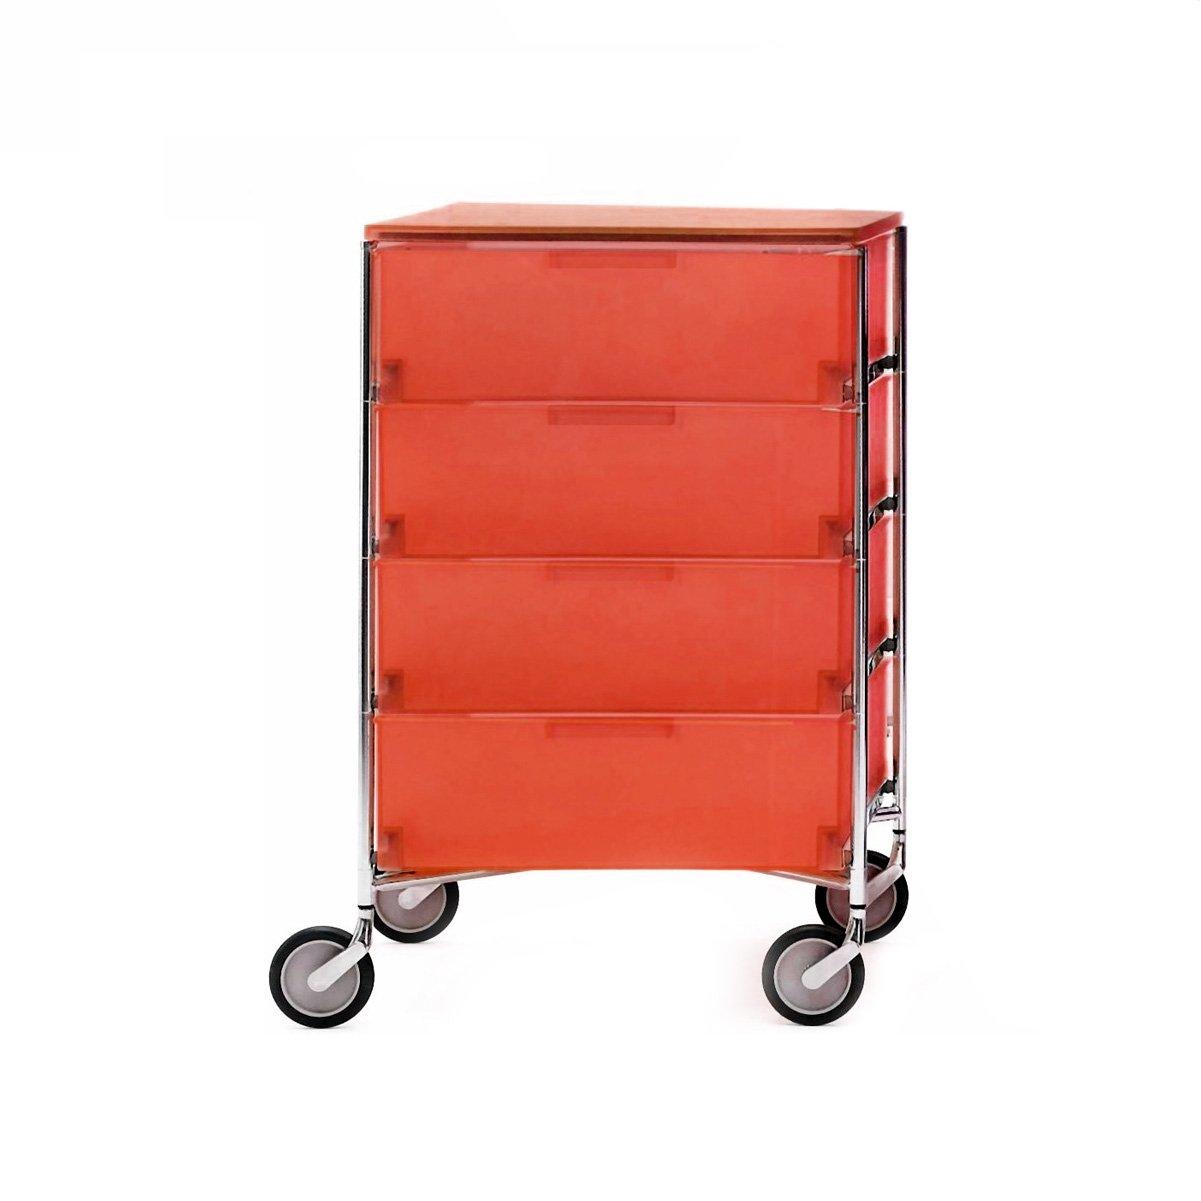 Kartell 2024L4 Container Mobil, 4 Schubladen, dunkelorange